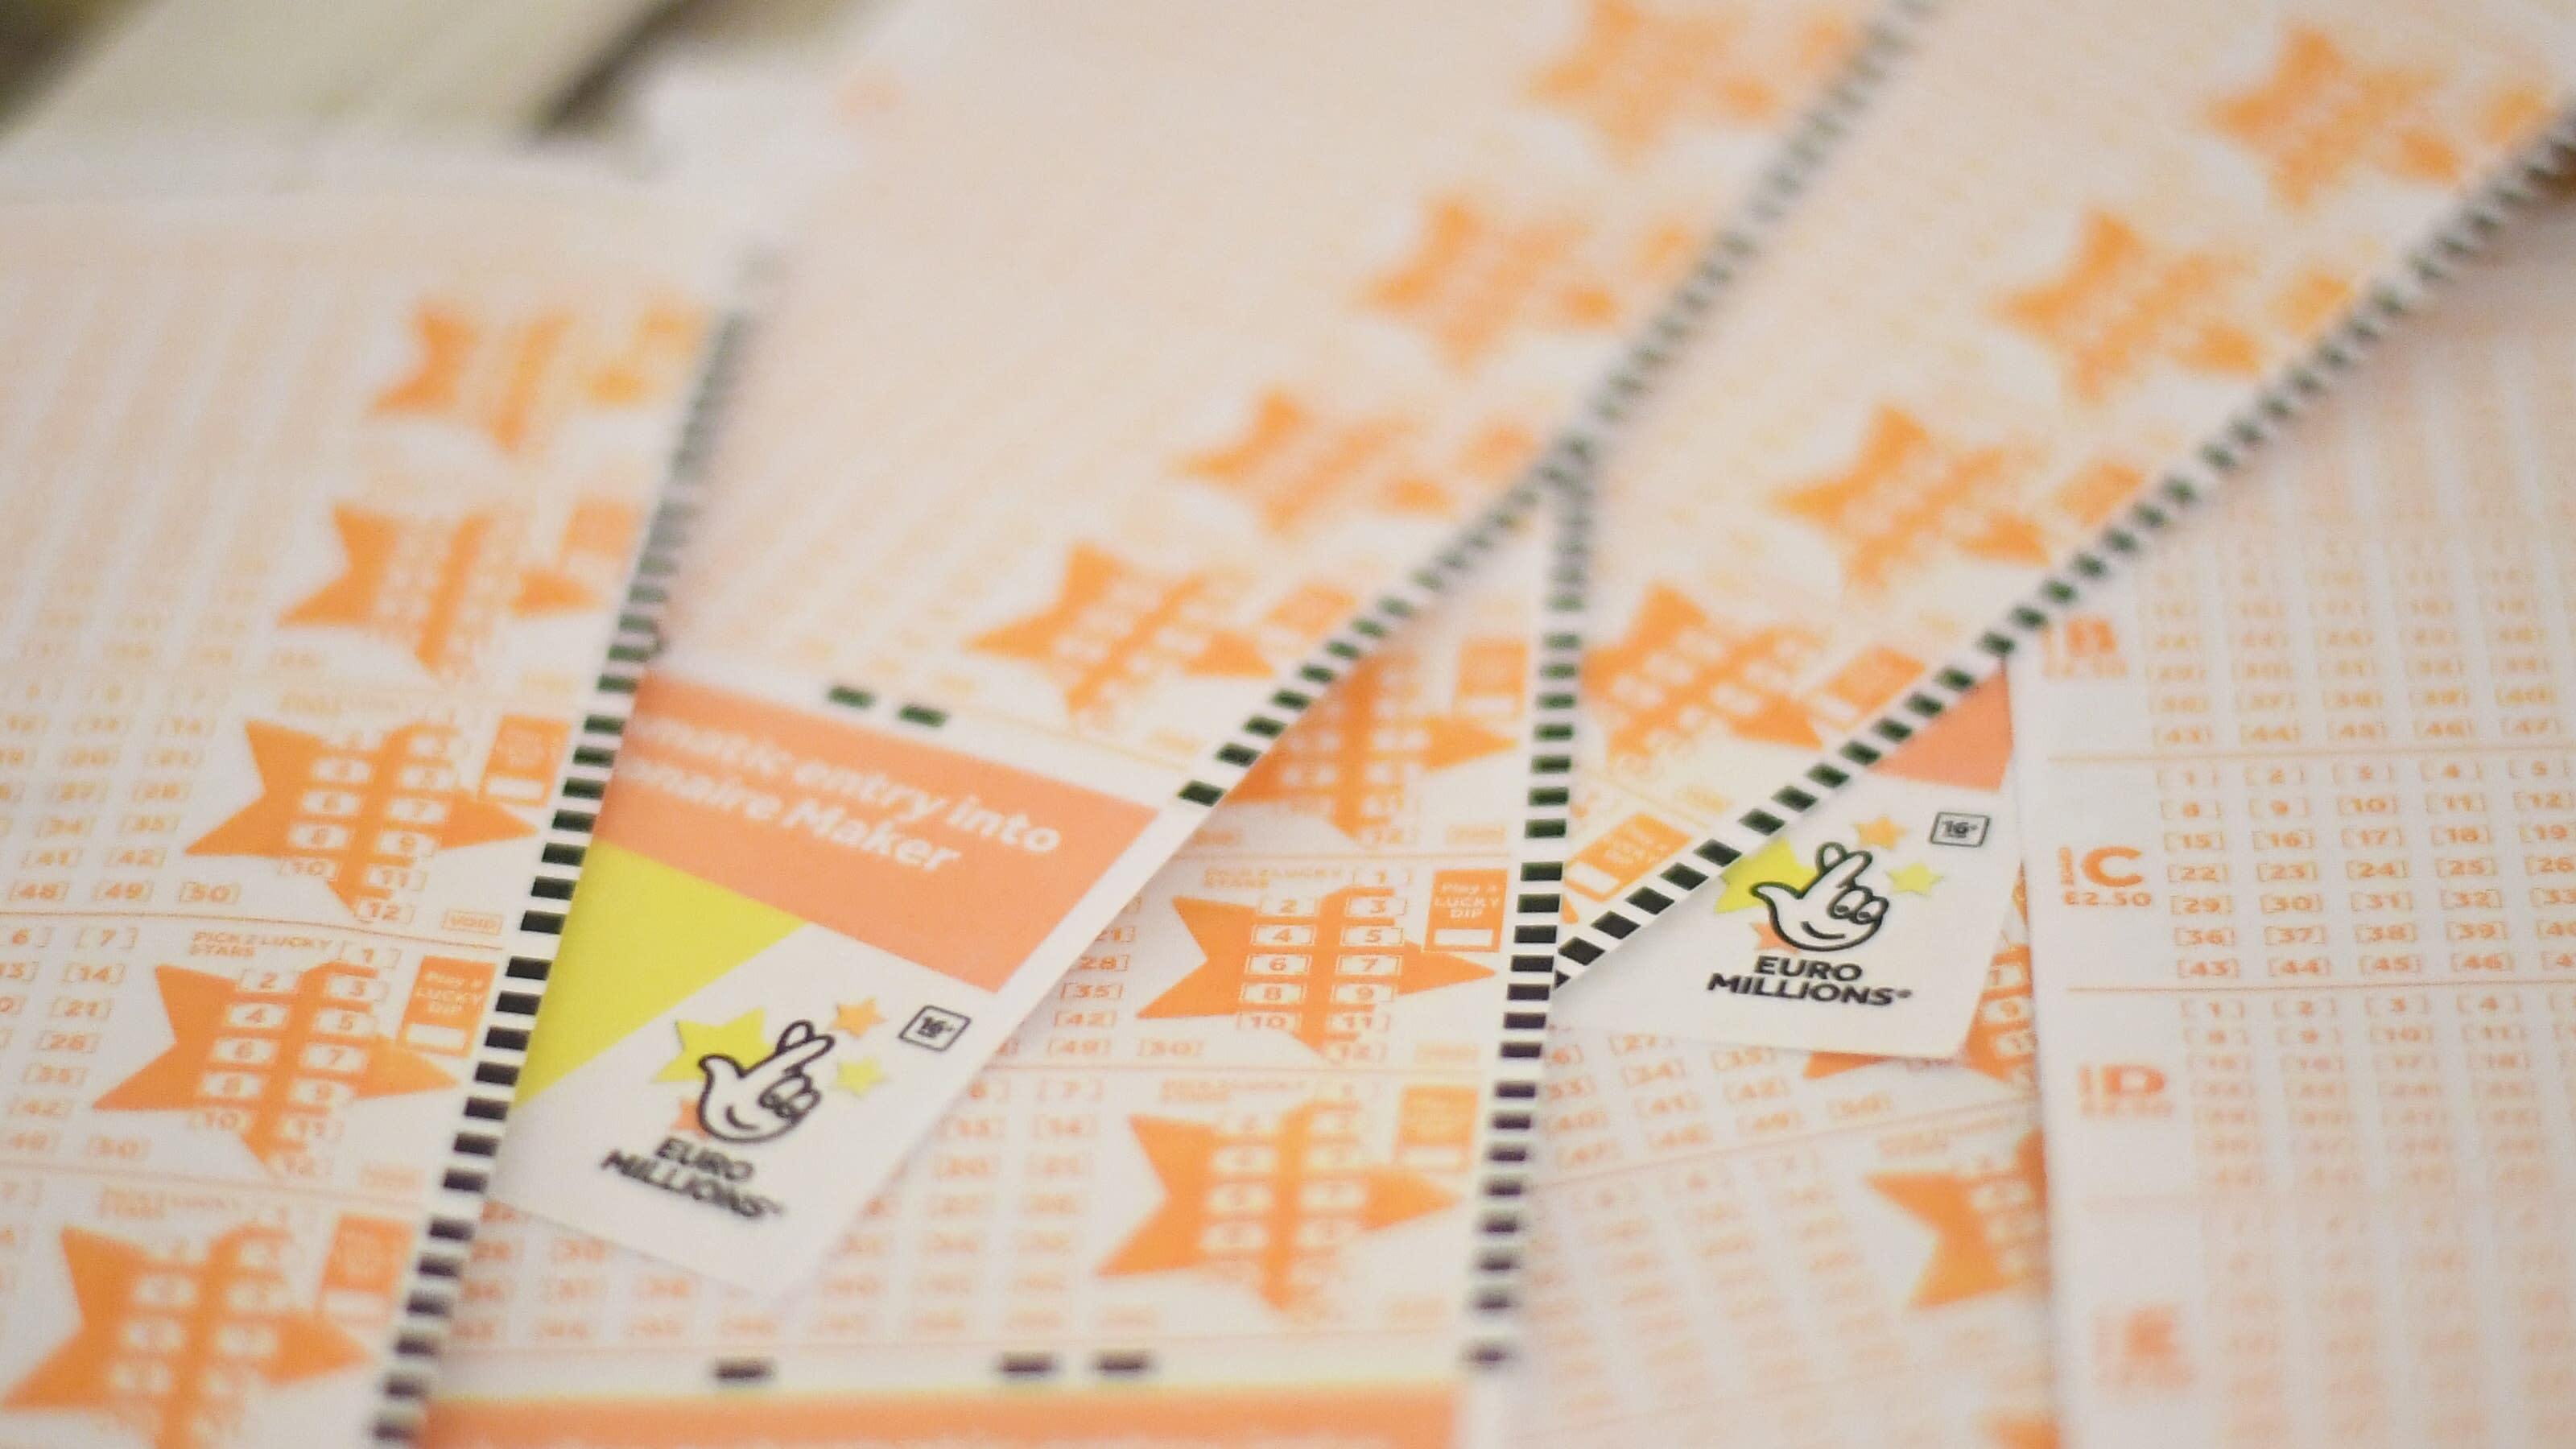 UK ticket-holder wins £105m EuroMillions jackpot